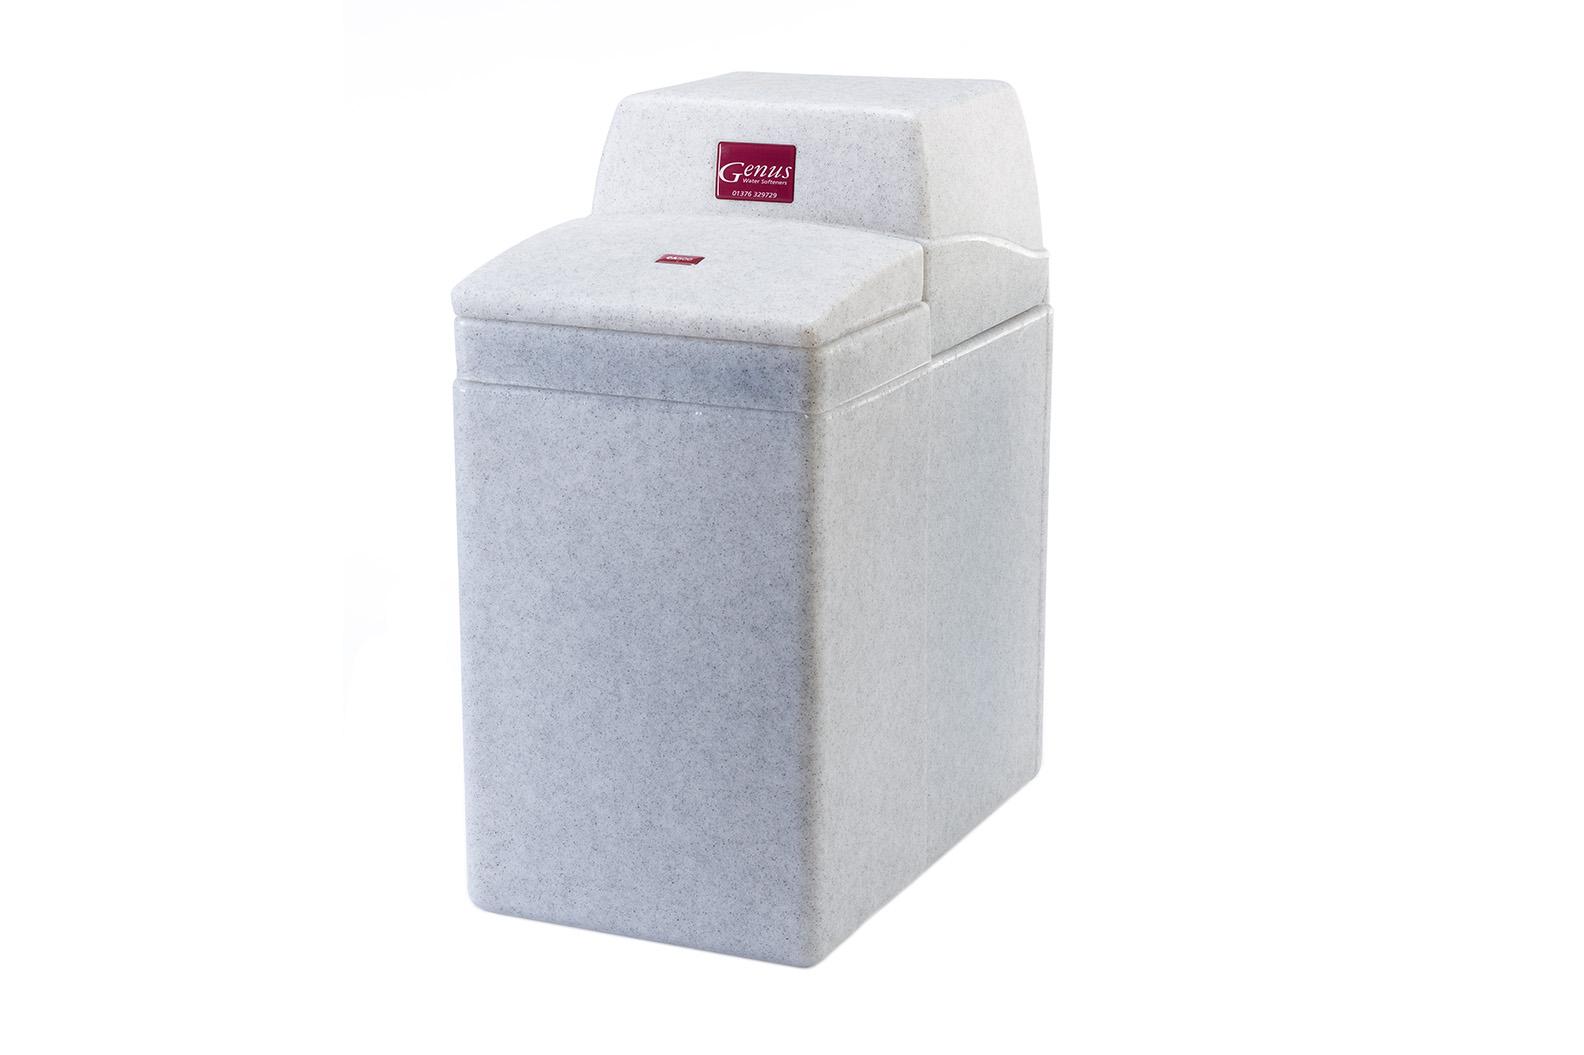 Genus CA 500 water softeners